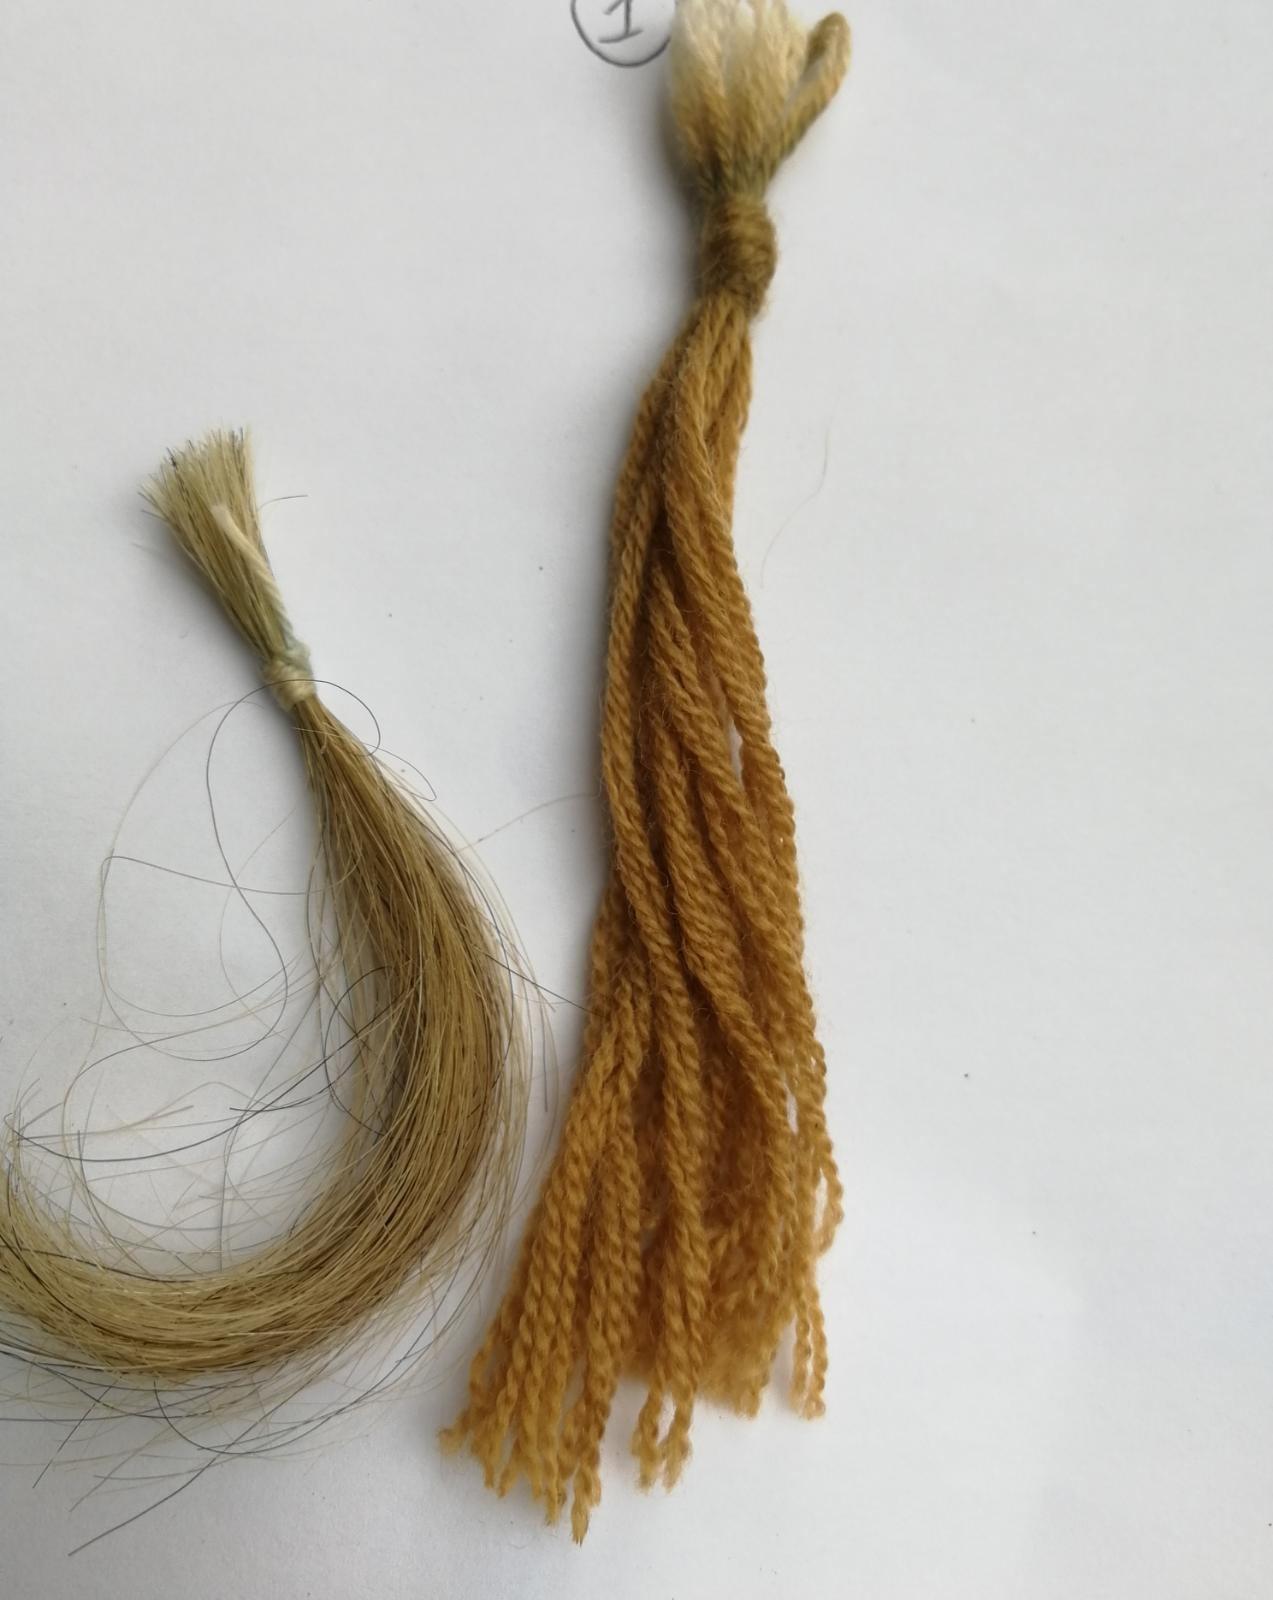 crspinobis